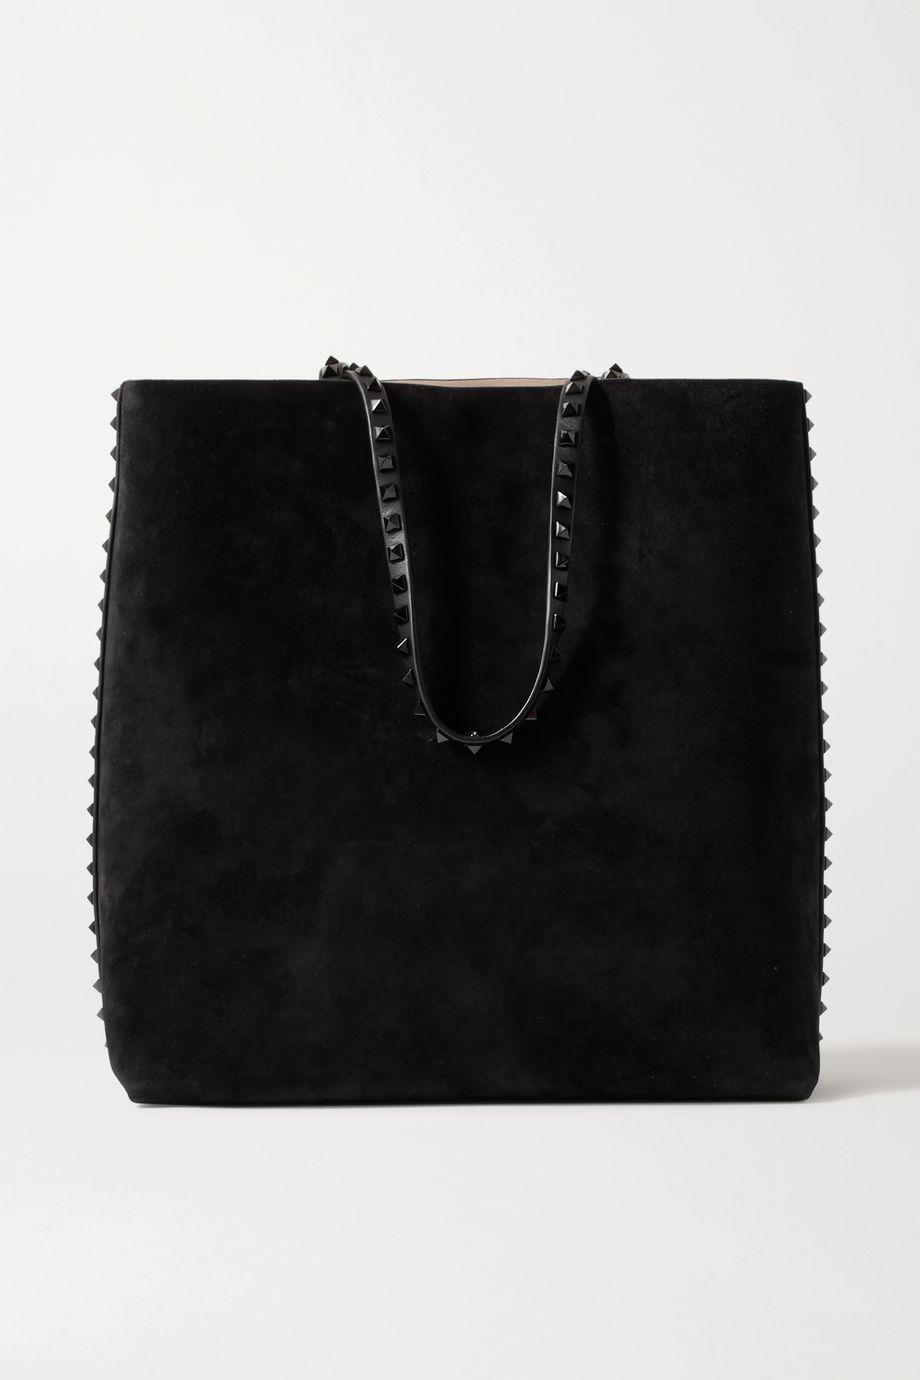 Valentino Valentino Garavani Rockstud suede and leather tote